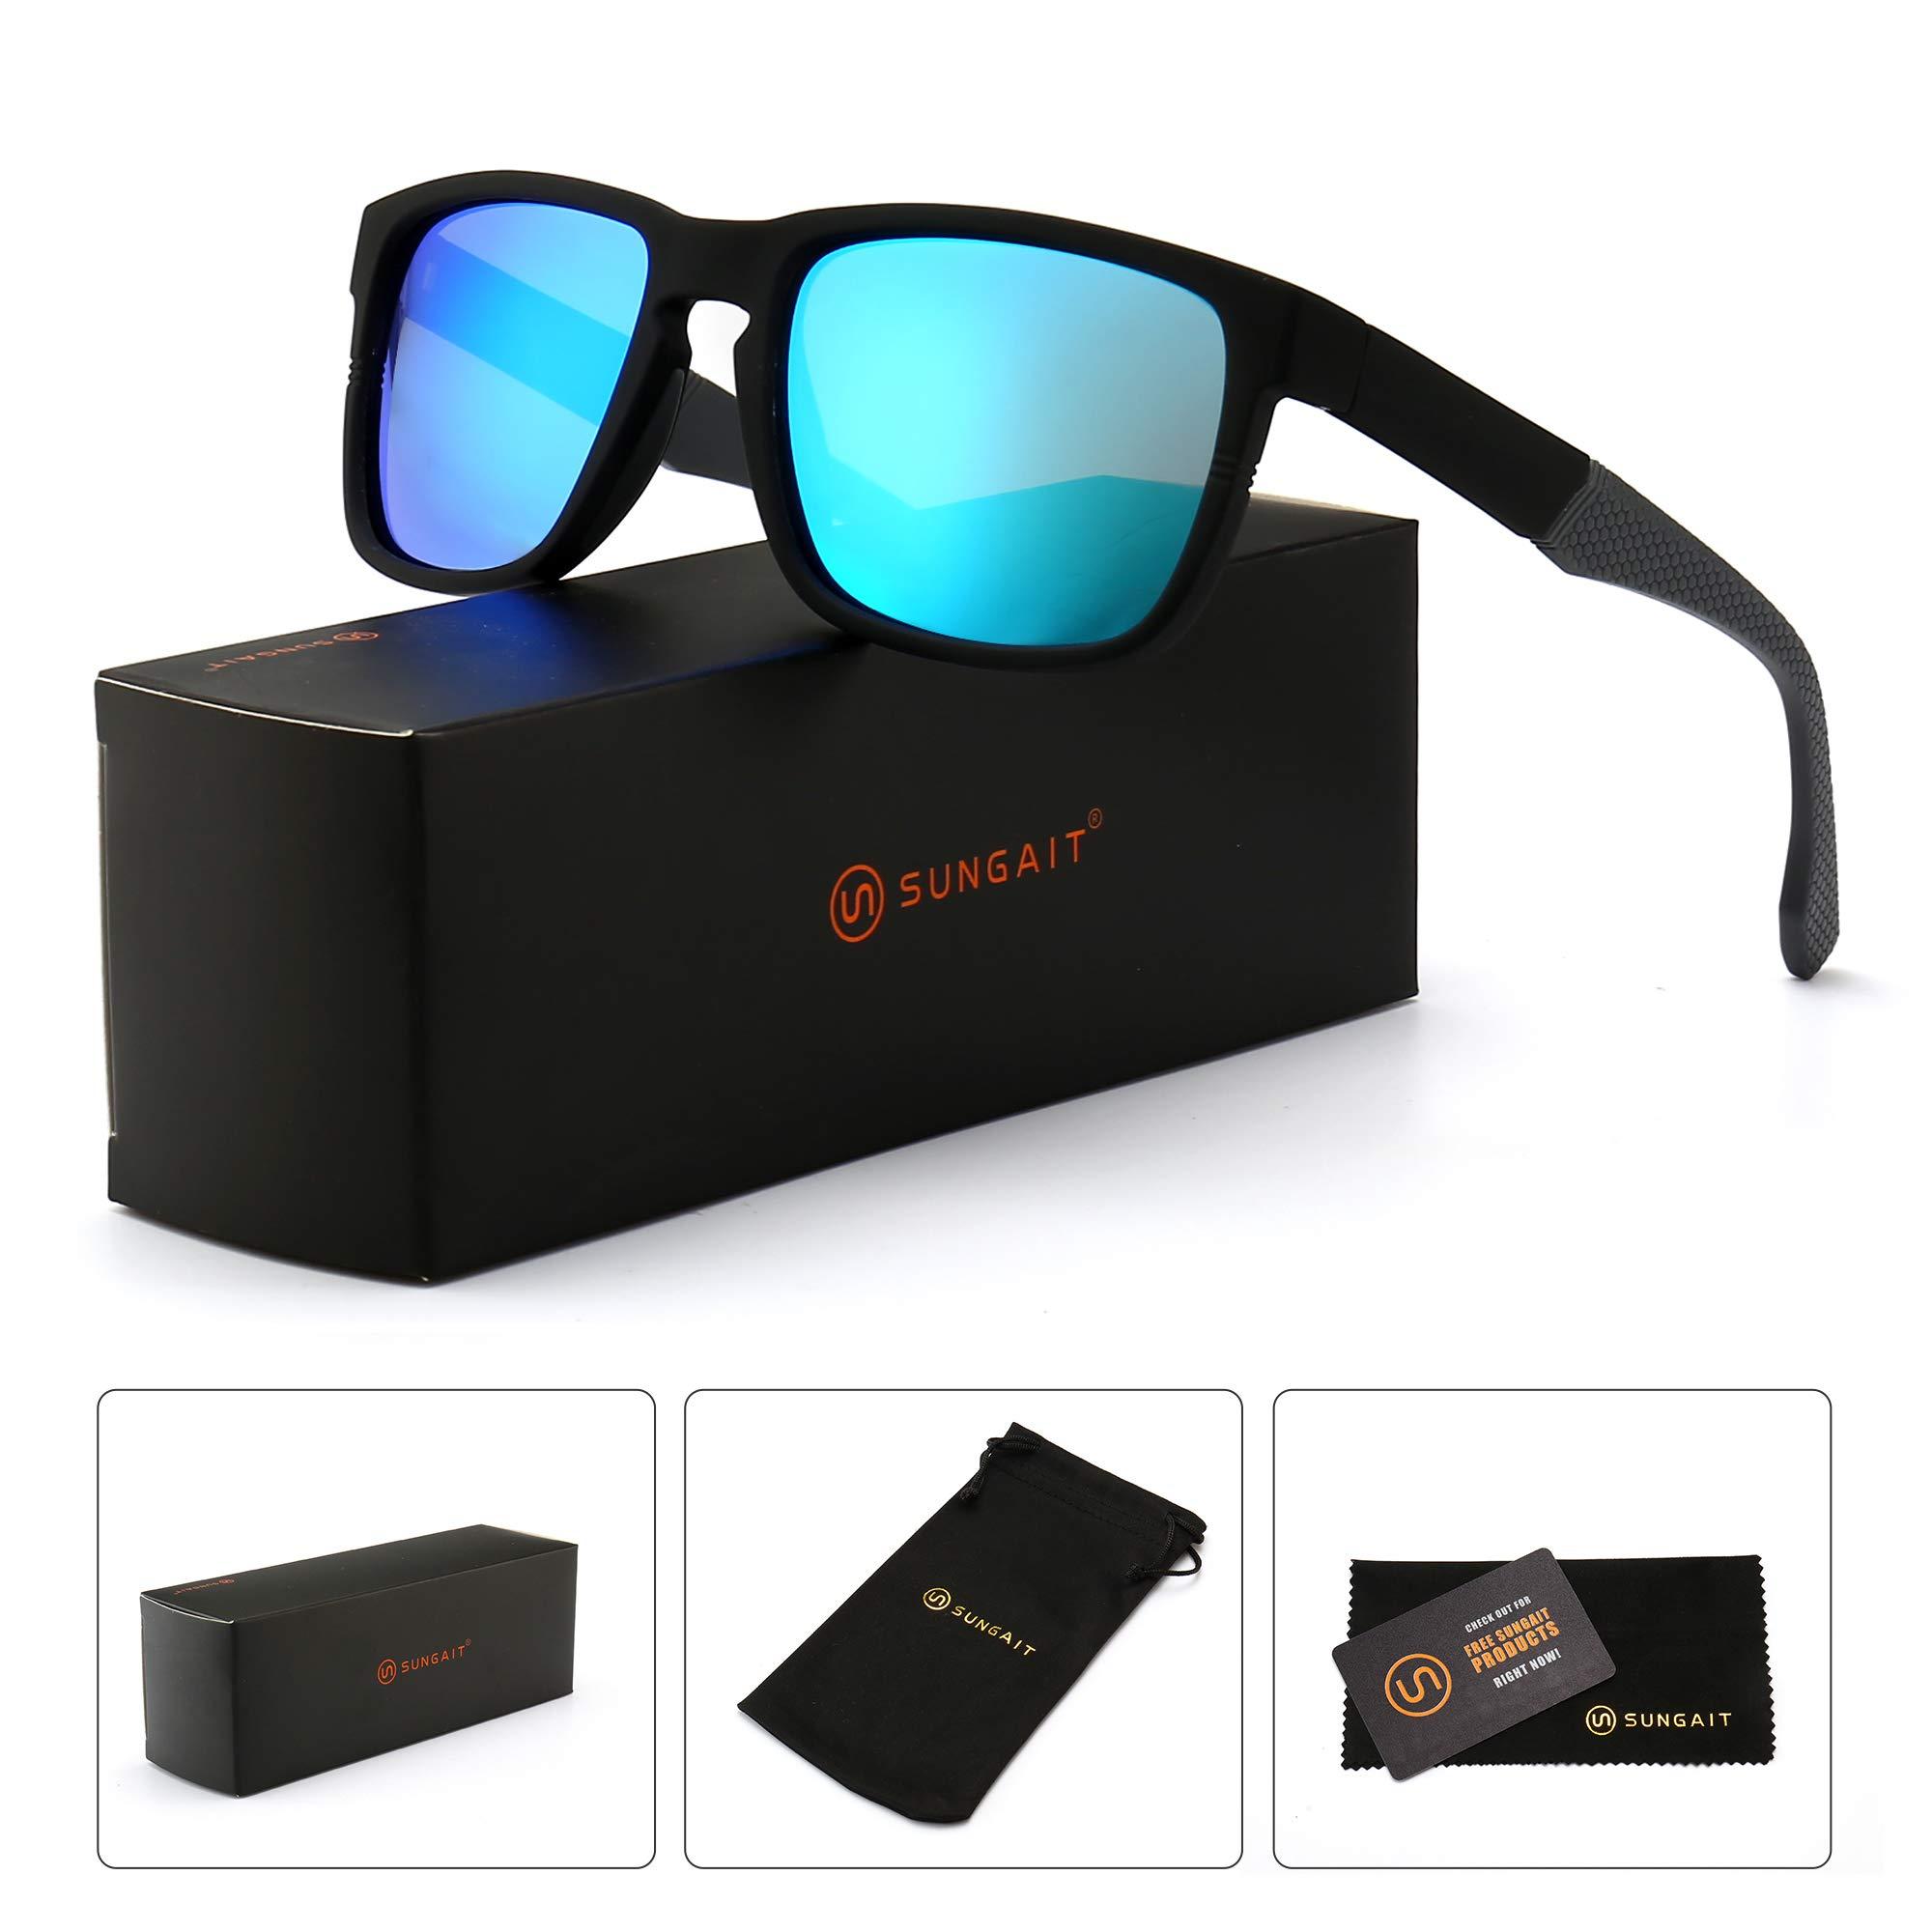 f38c732d253 SUNGAIT Unisex Polarized Sunglasses Stylish Sun Glasses with Spring Hinges  (Black Frame (Matte Finish)  Blue Mirror Lens) A529 HKLA